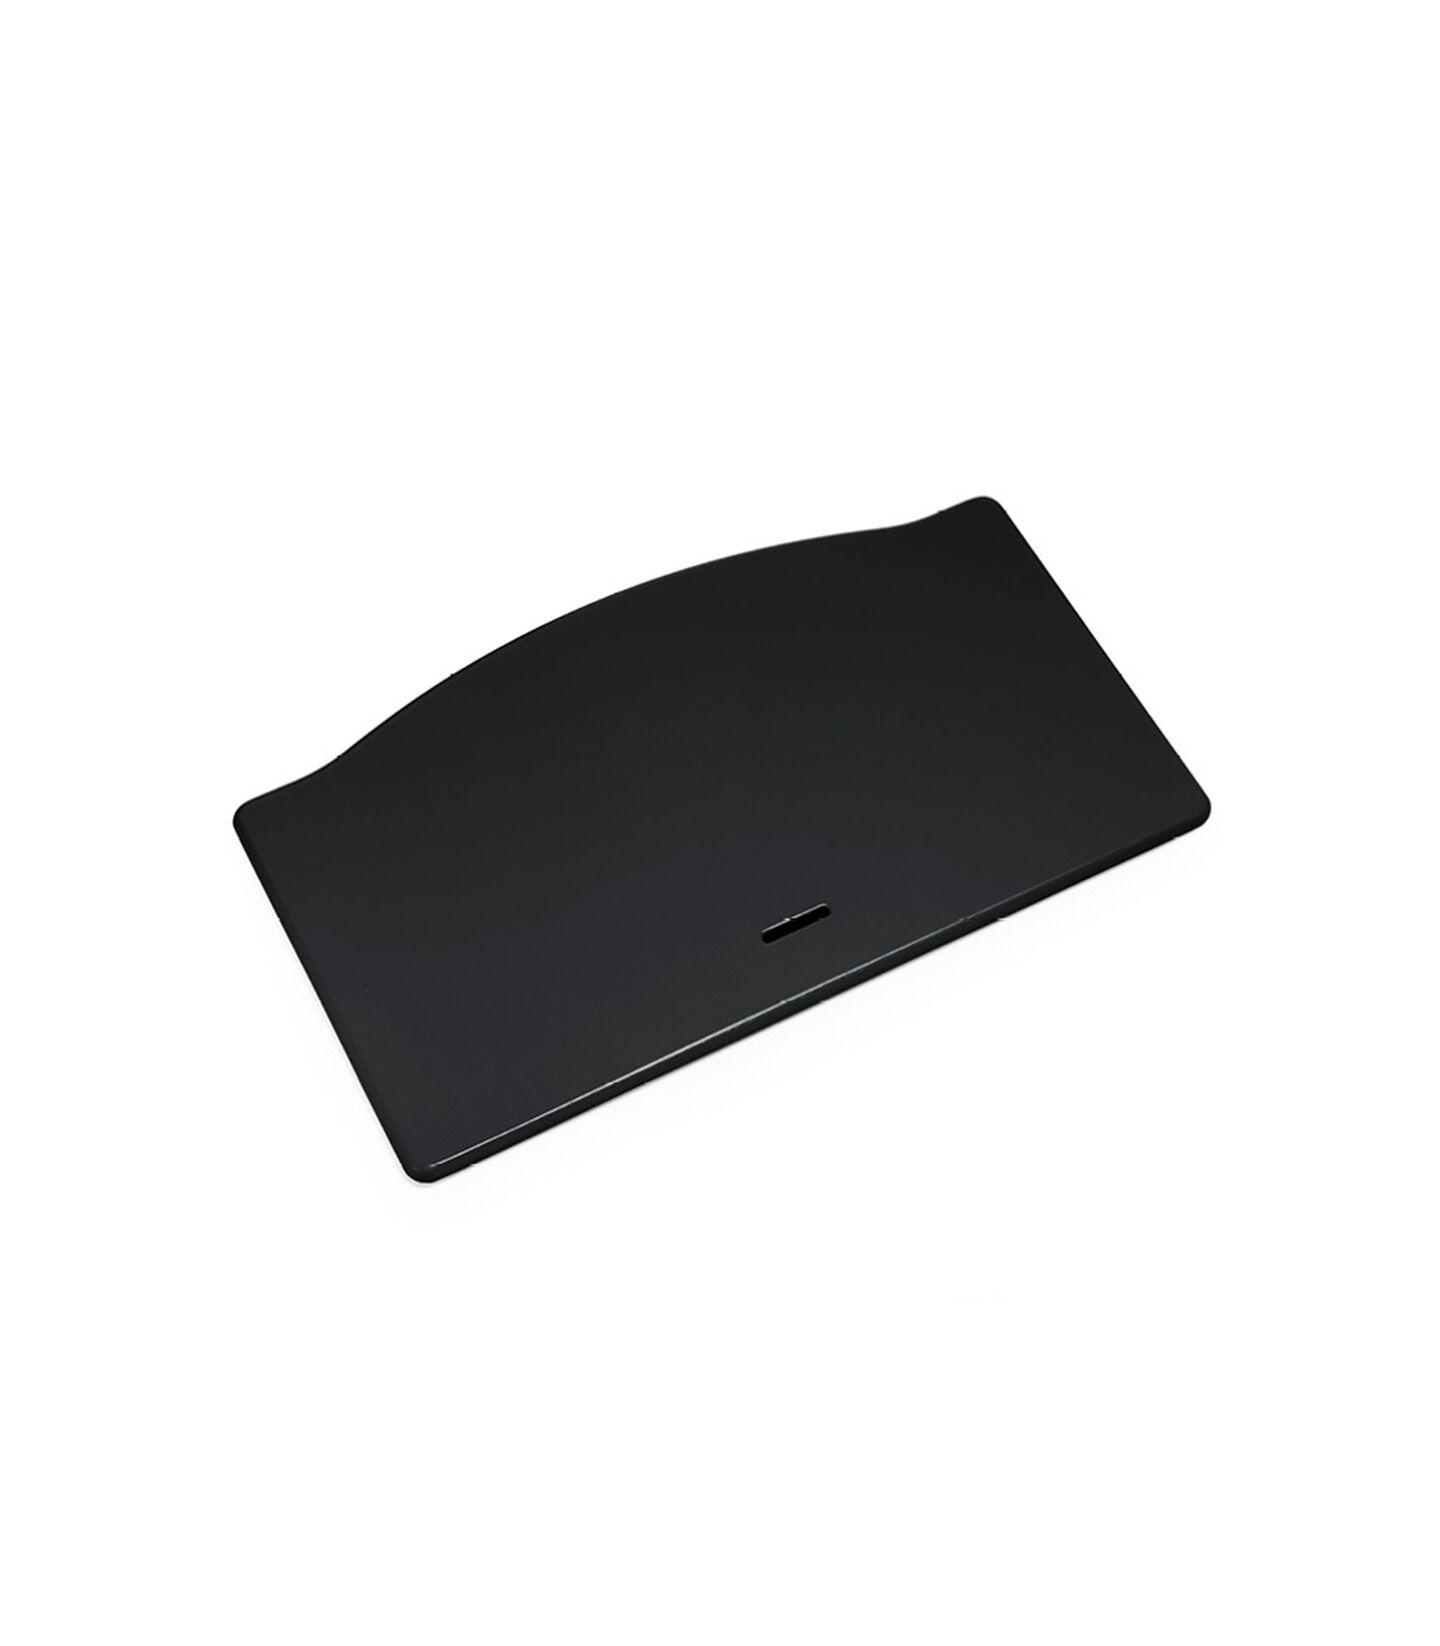 Tripp Trapp® Zitplaat Black, Black, mainview view 1